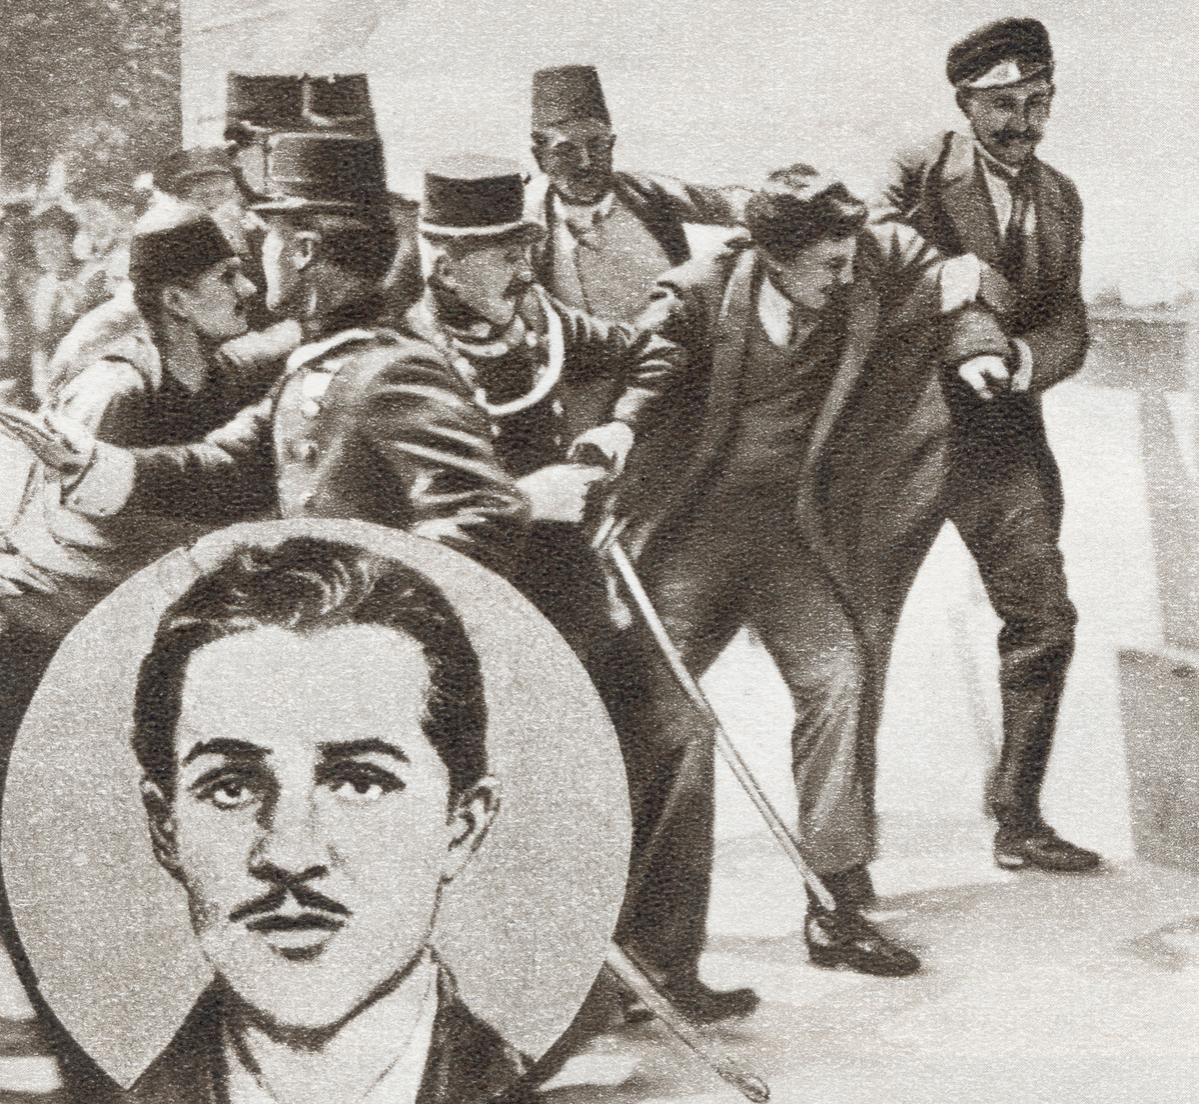 The police arresting Gavrilo Princip,  who assassinated Archduke Franz Ferdinand of Austria